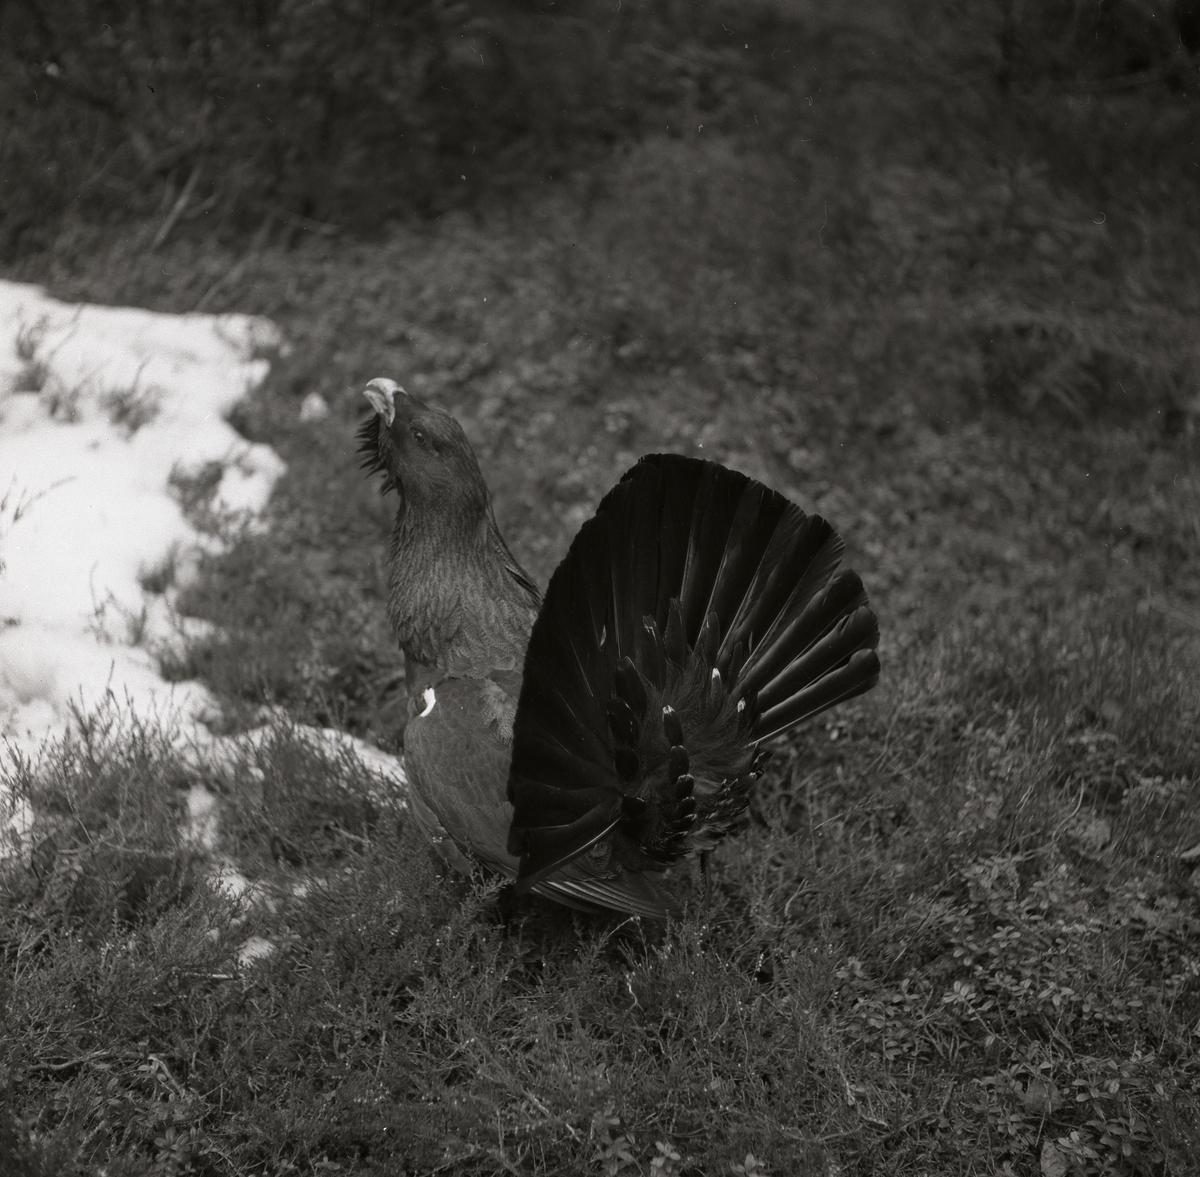 En tjäder står på marken bredvid lite snö 18 april 1954.